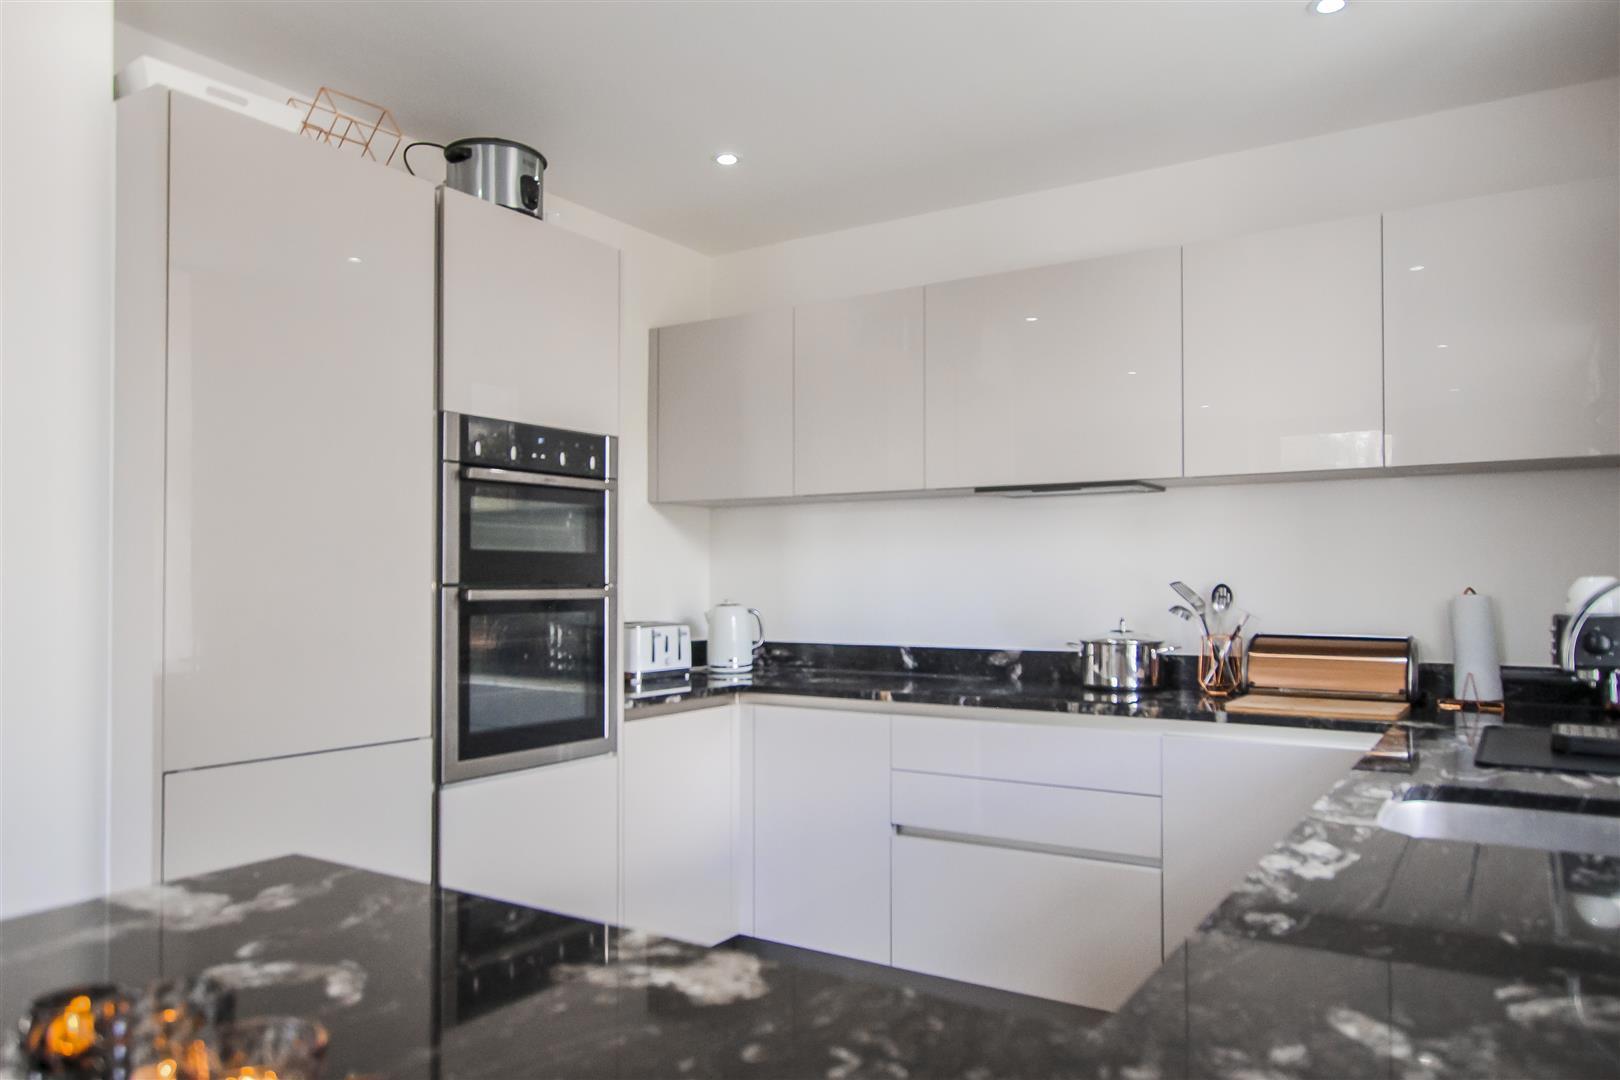 3 Bedroom Duplex Apartment For Sale - Image 36